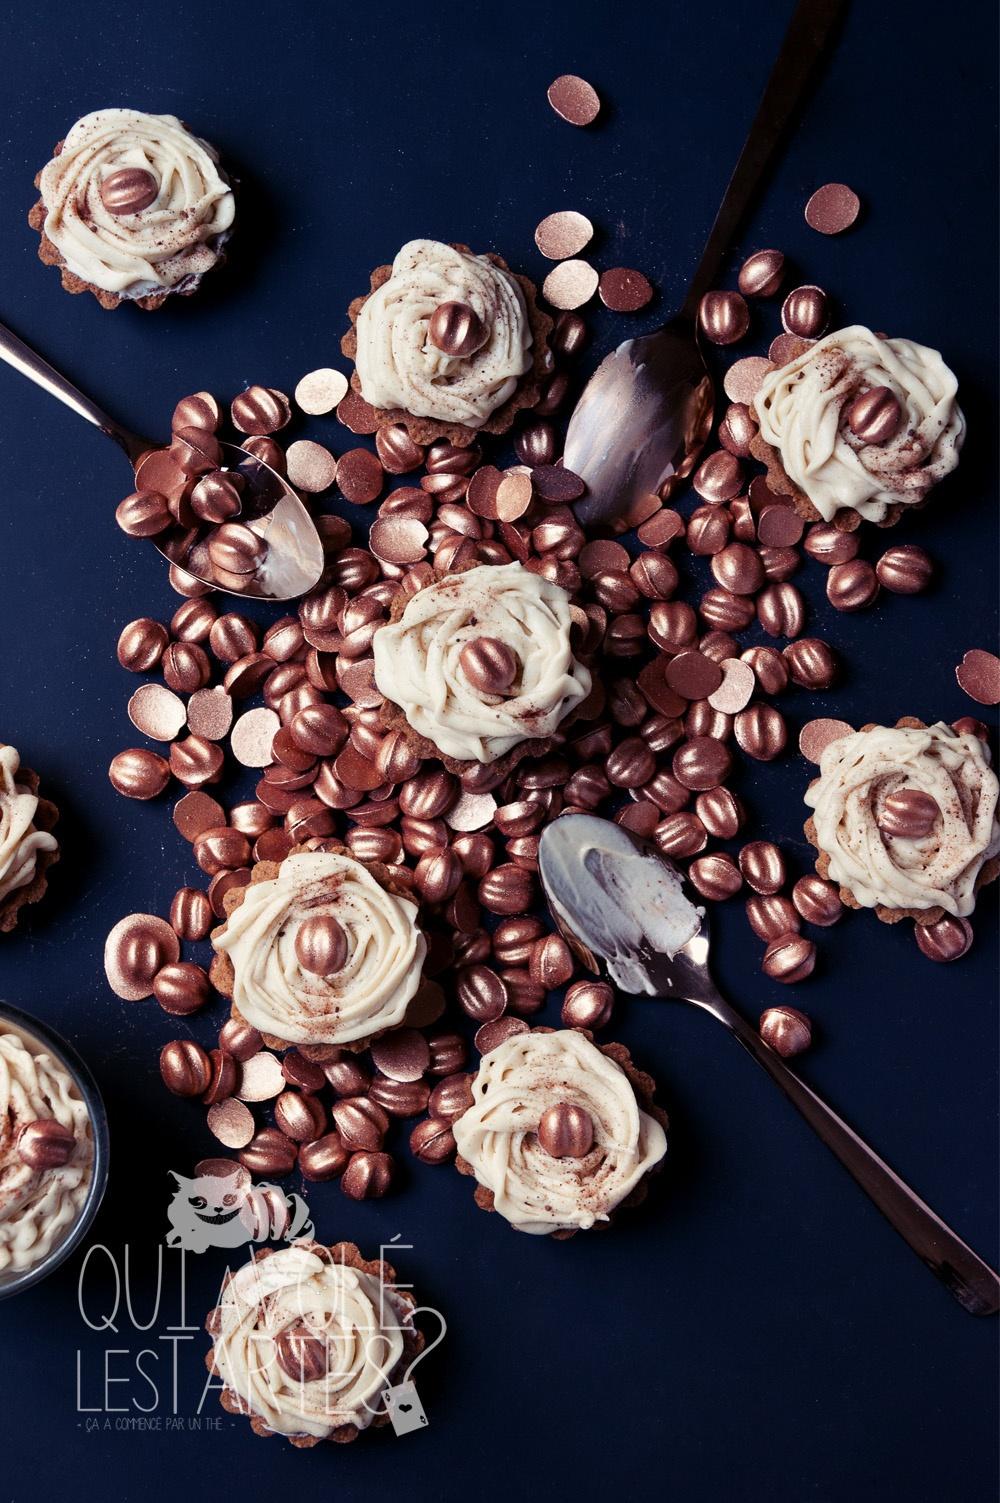 Tartelettes Cappuccino 3 - Studio 2 création - Qui a volé les tartes